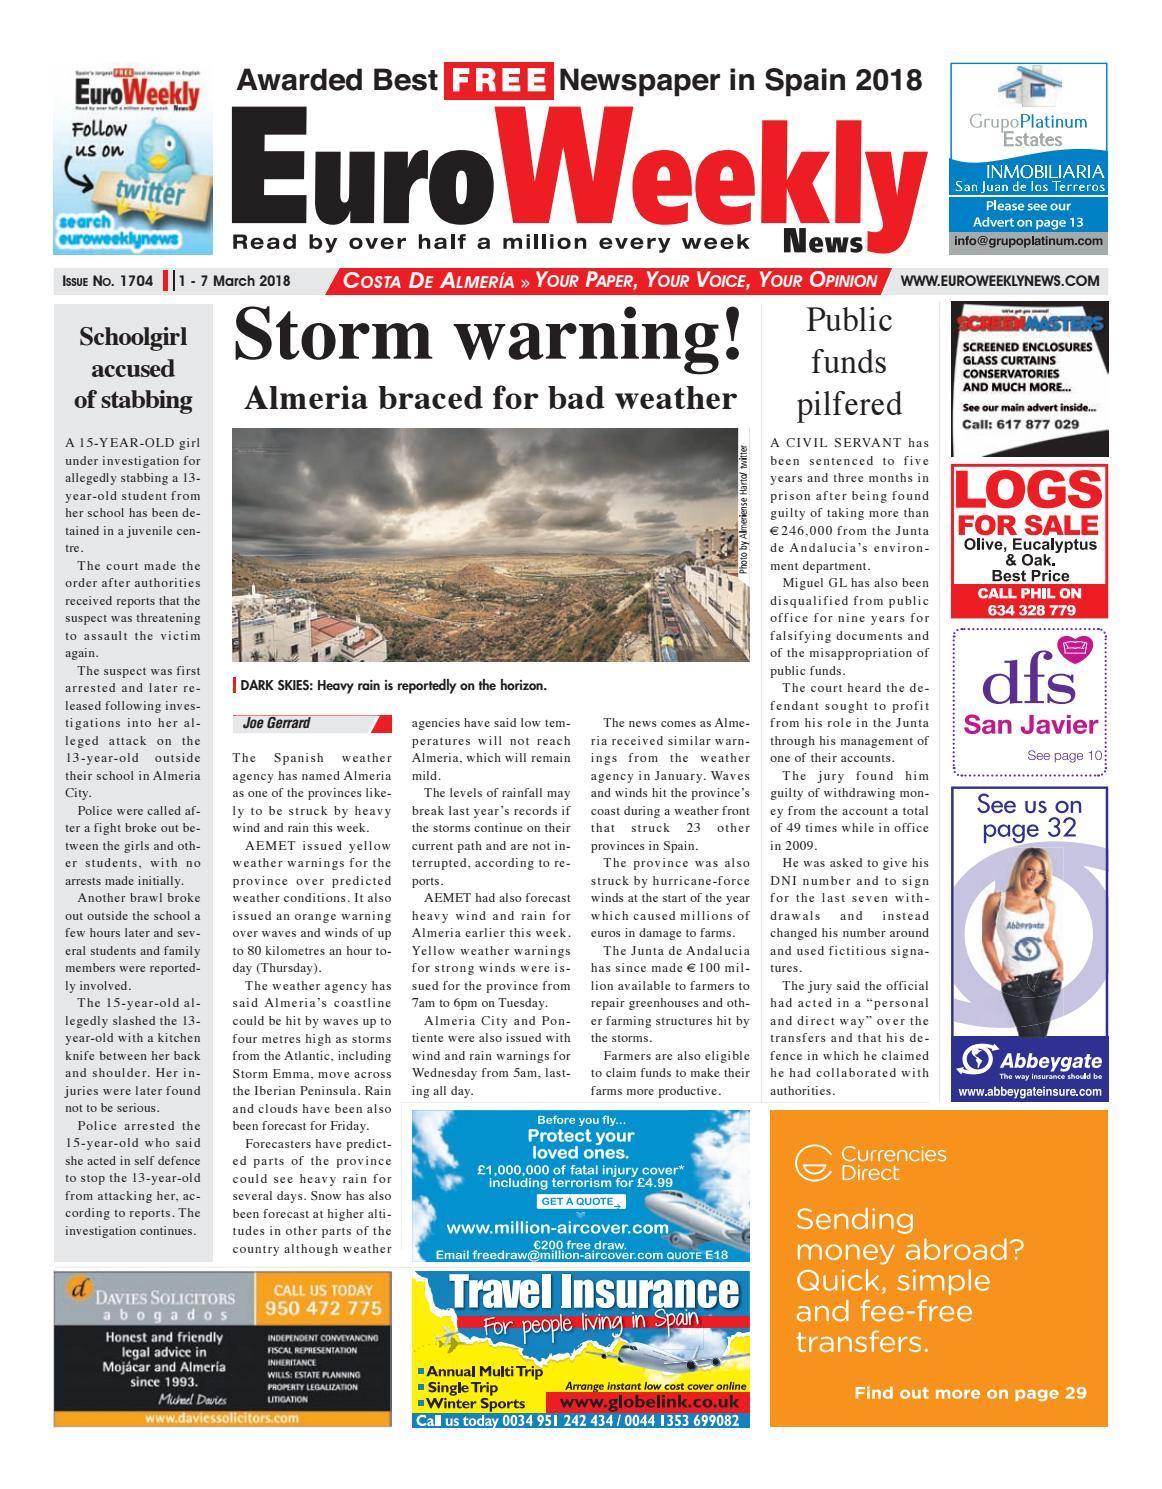 Euro Weekly News - Costa de Almeria 1 - 7 March 2018 Issue 1704 by ...